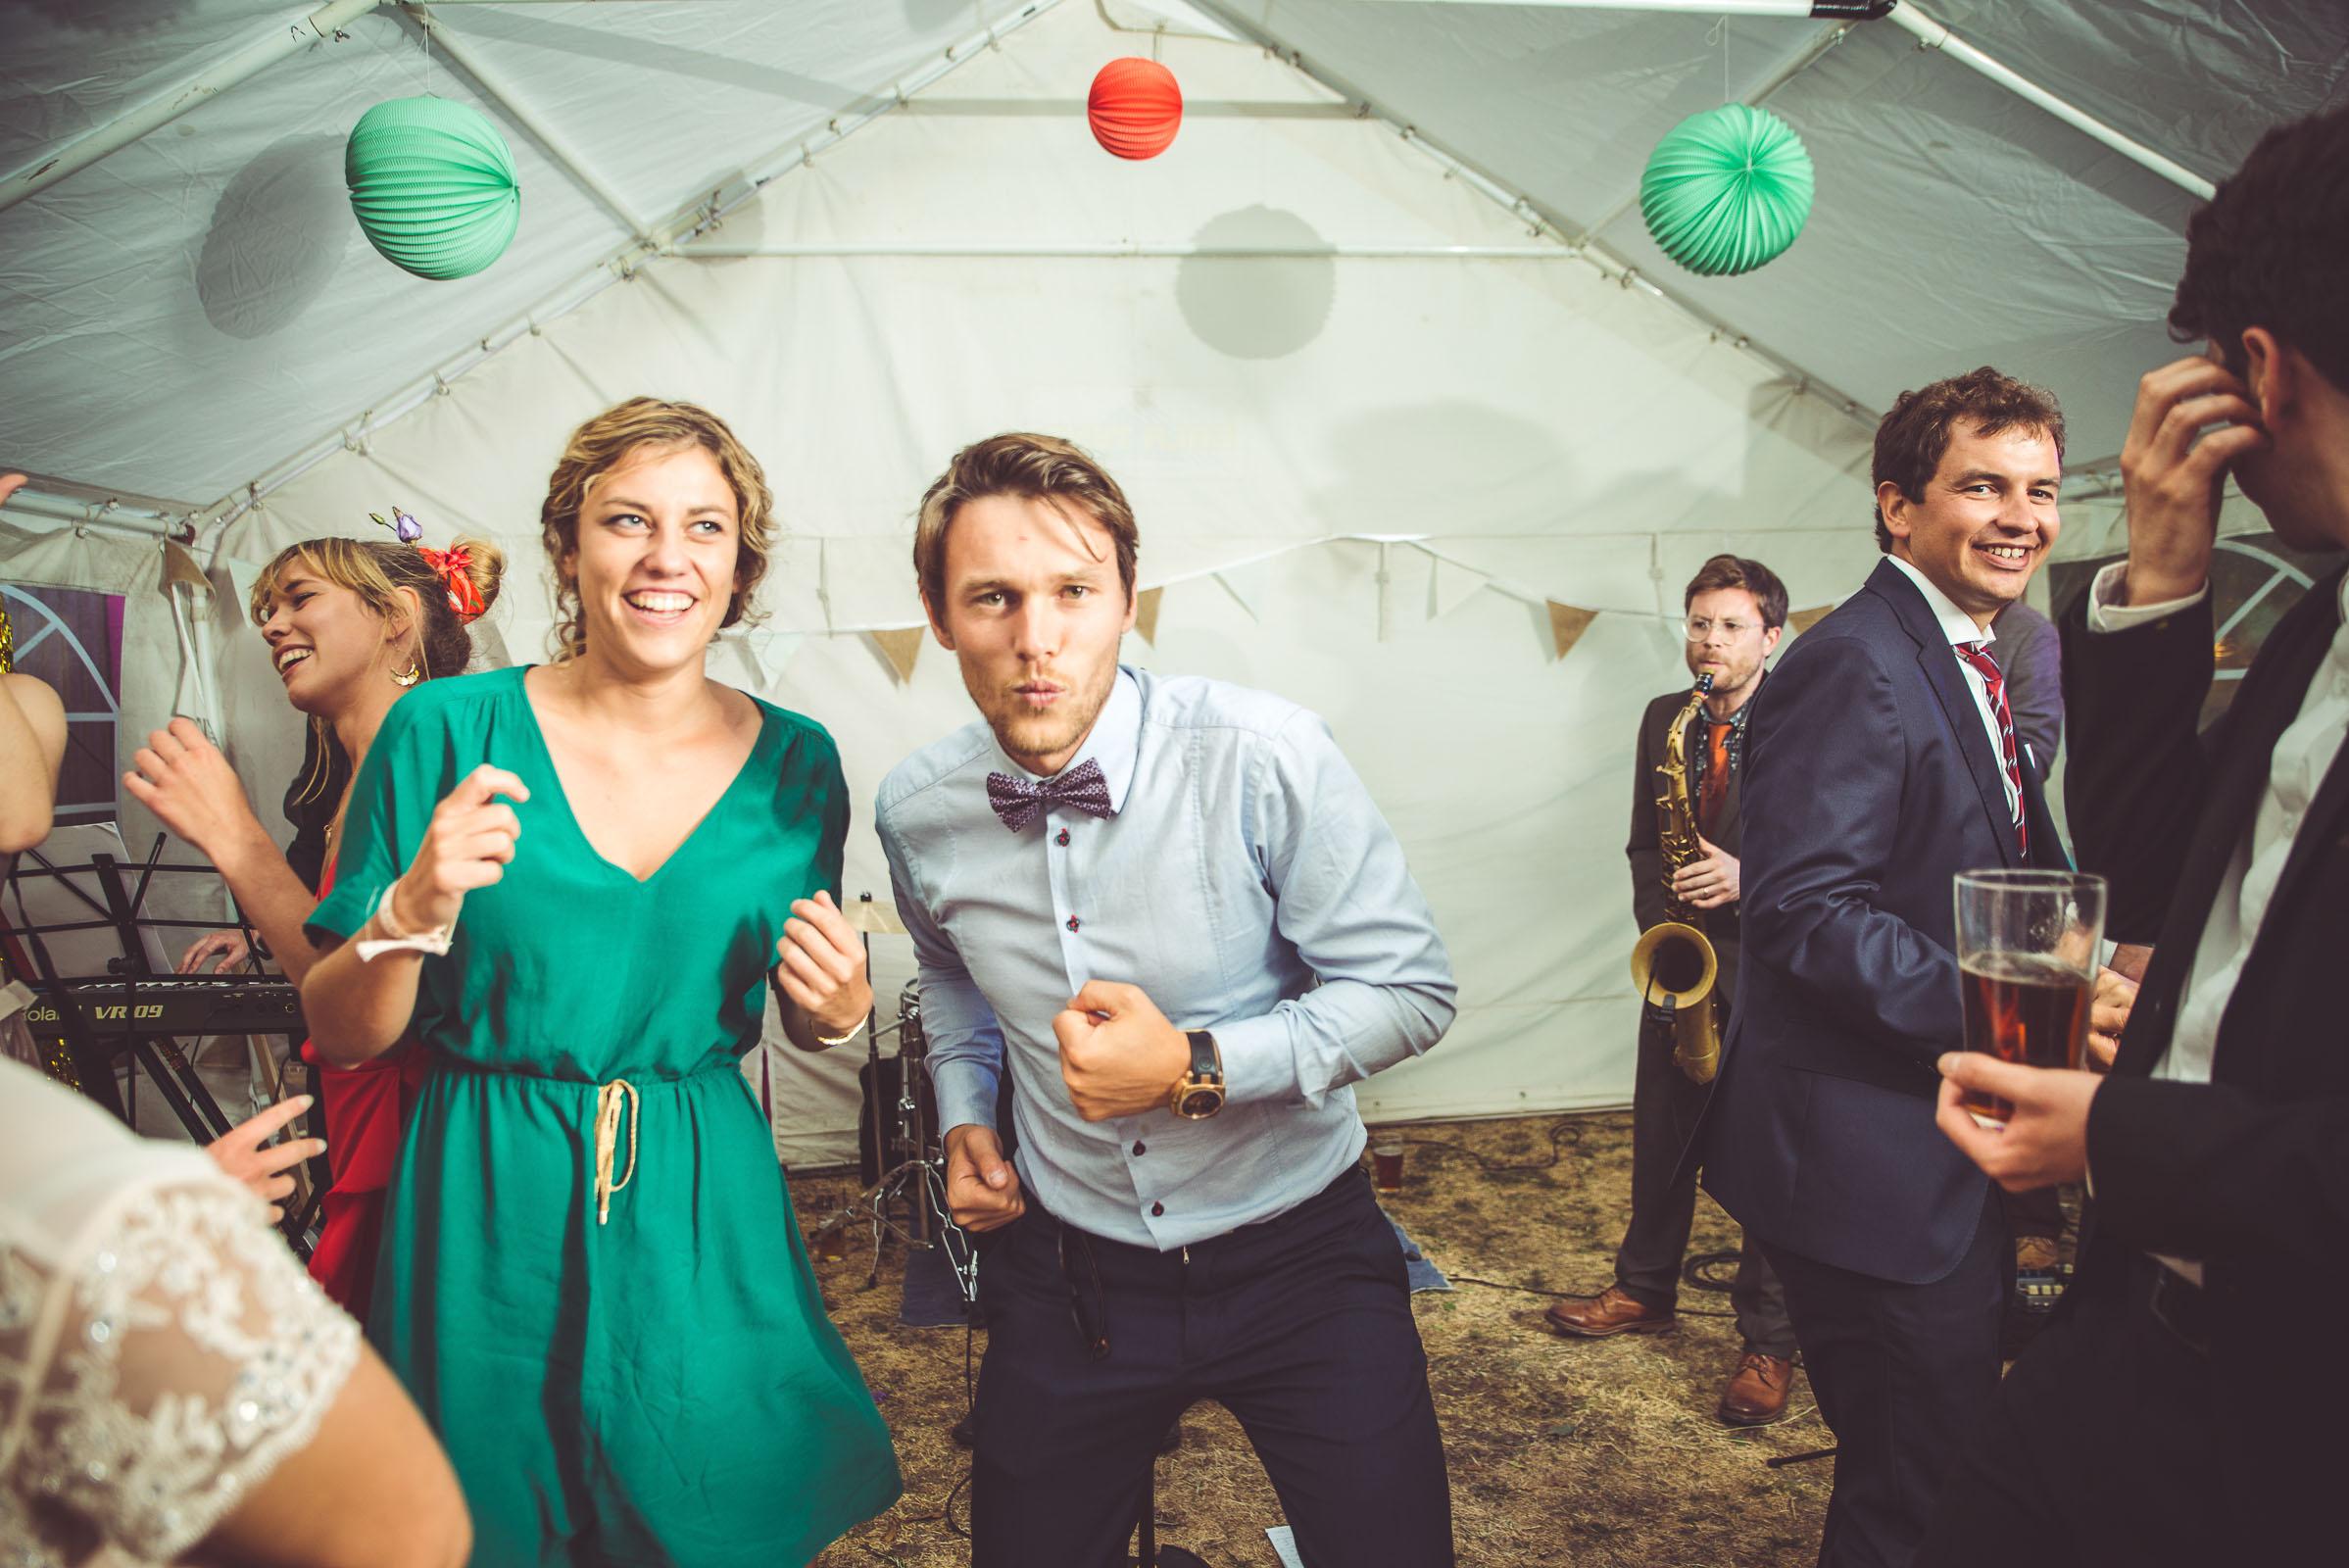 Hitchin_wedding_St_Pauls_Waldenbury_Royston_Wedding_Photographer-62.jpg